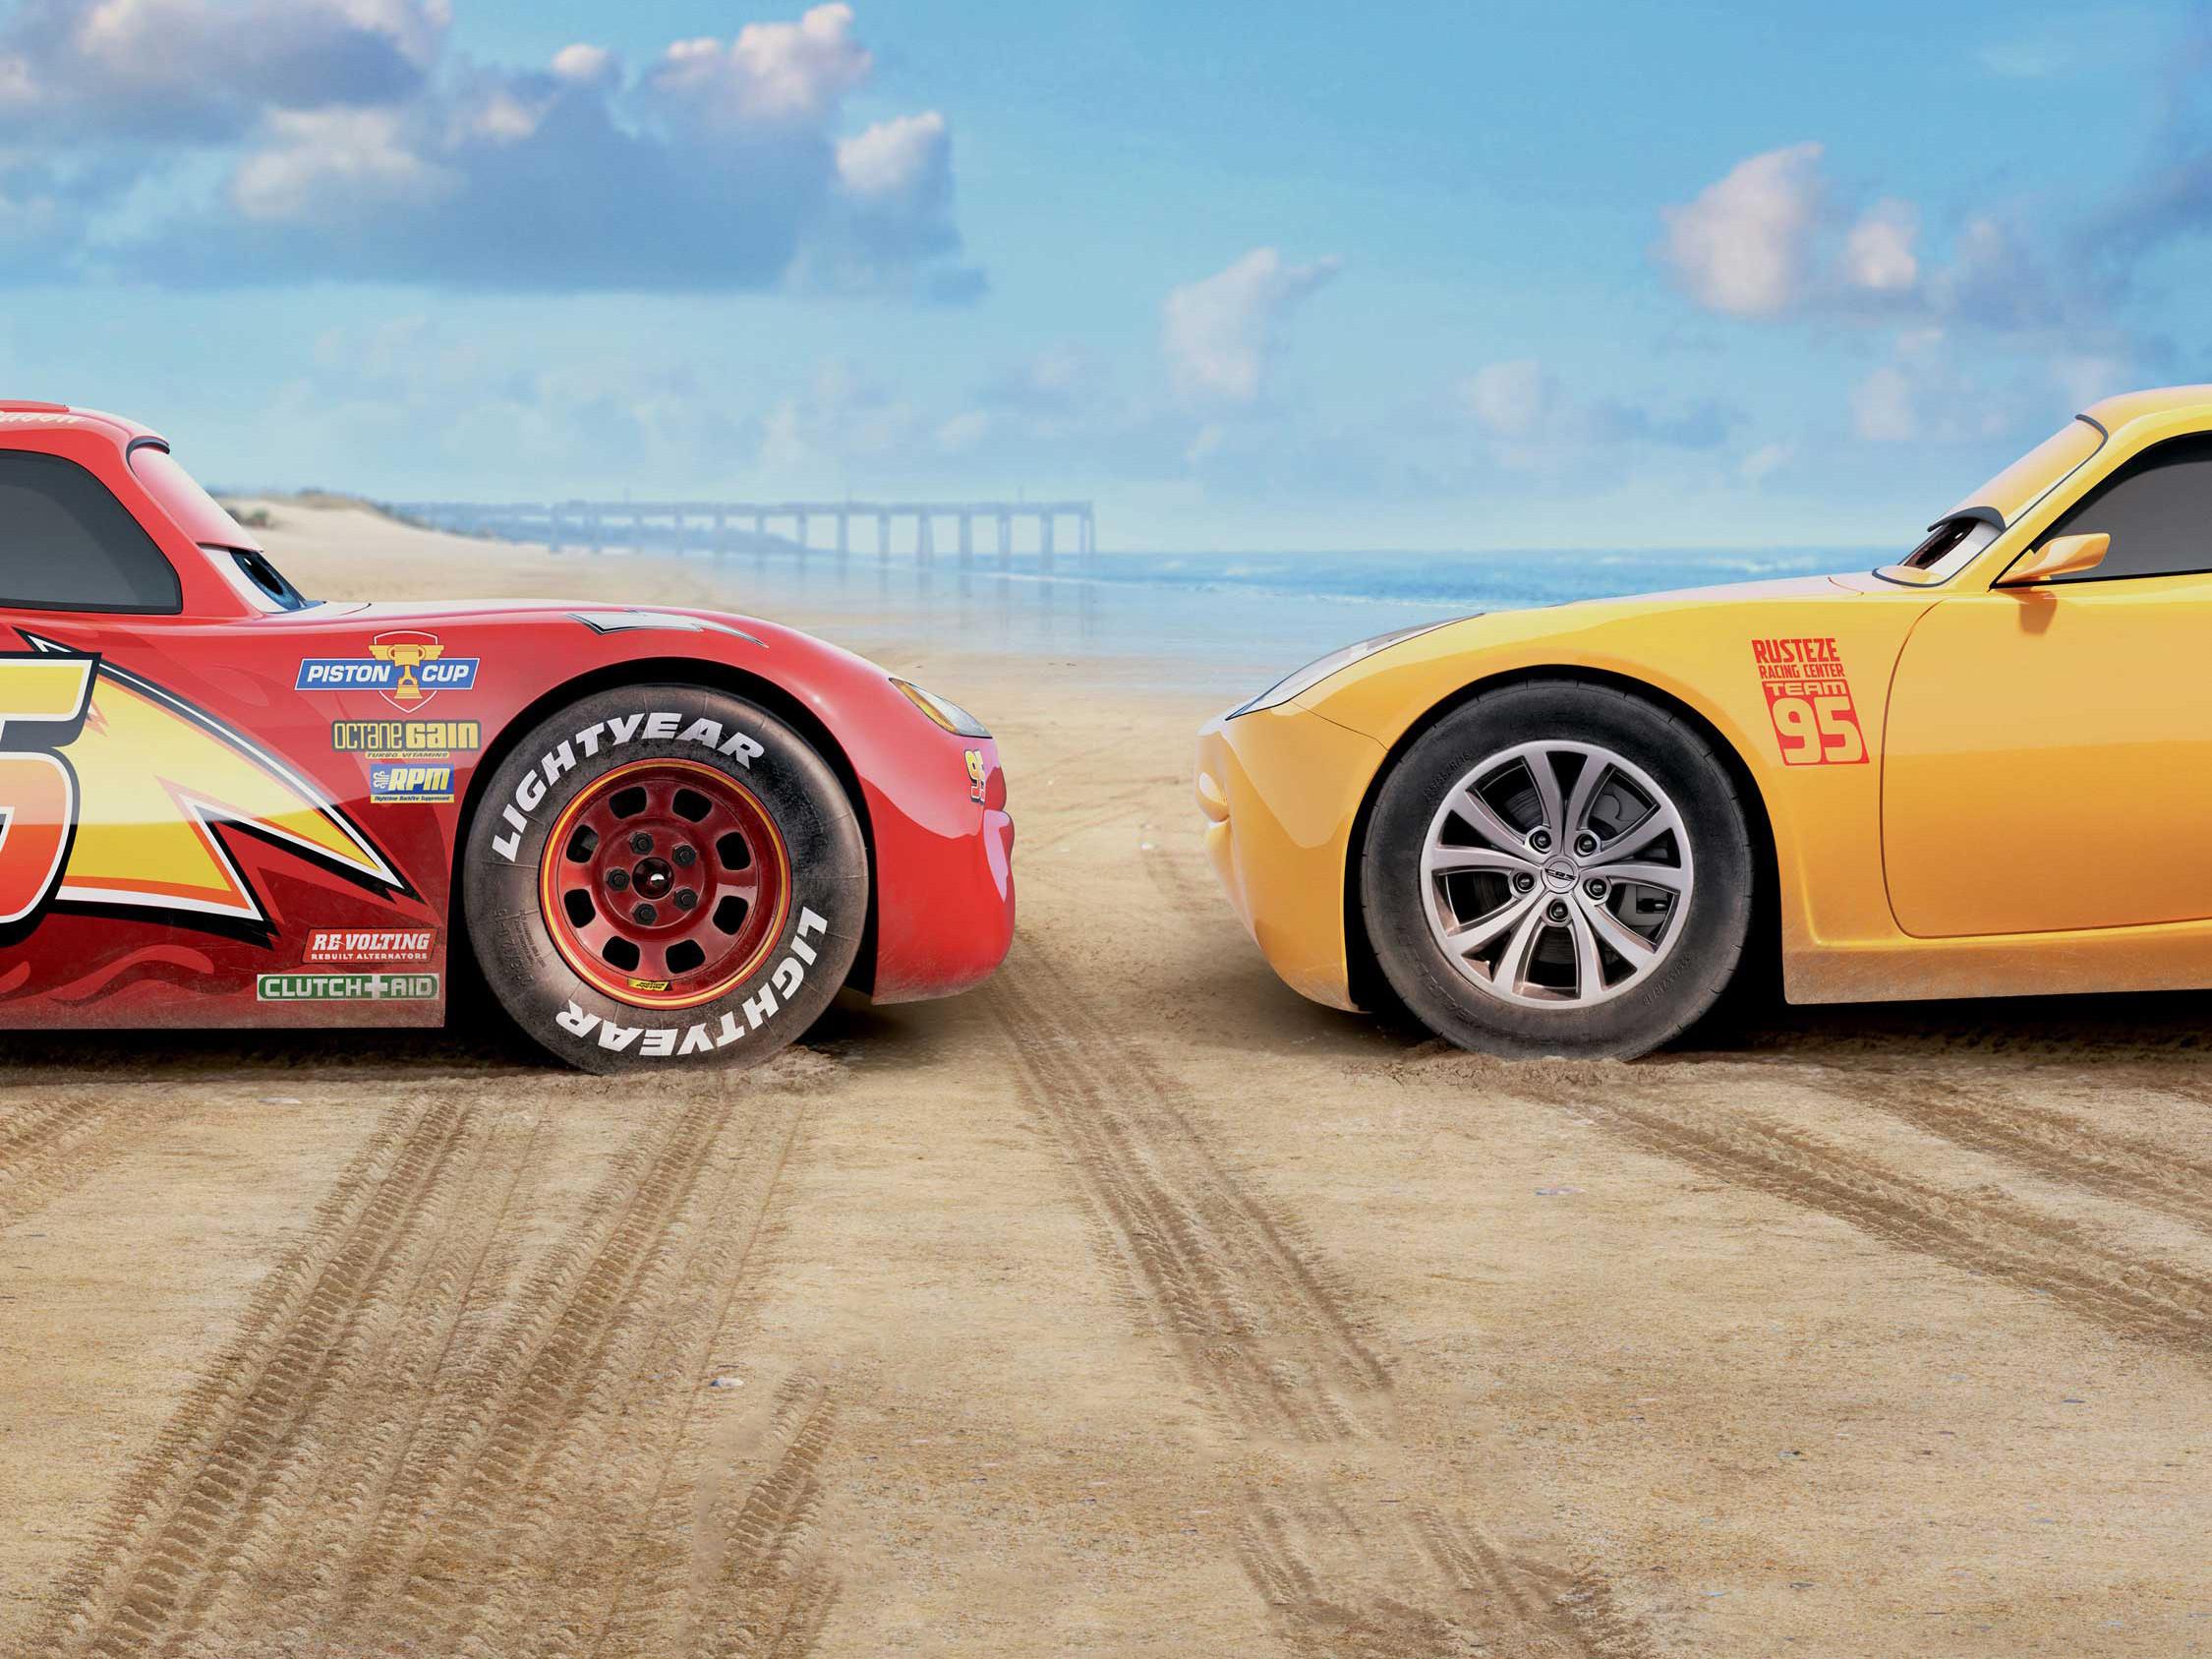 Disney Cars Movie Wallpaper 56 Images